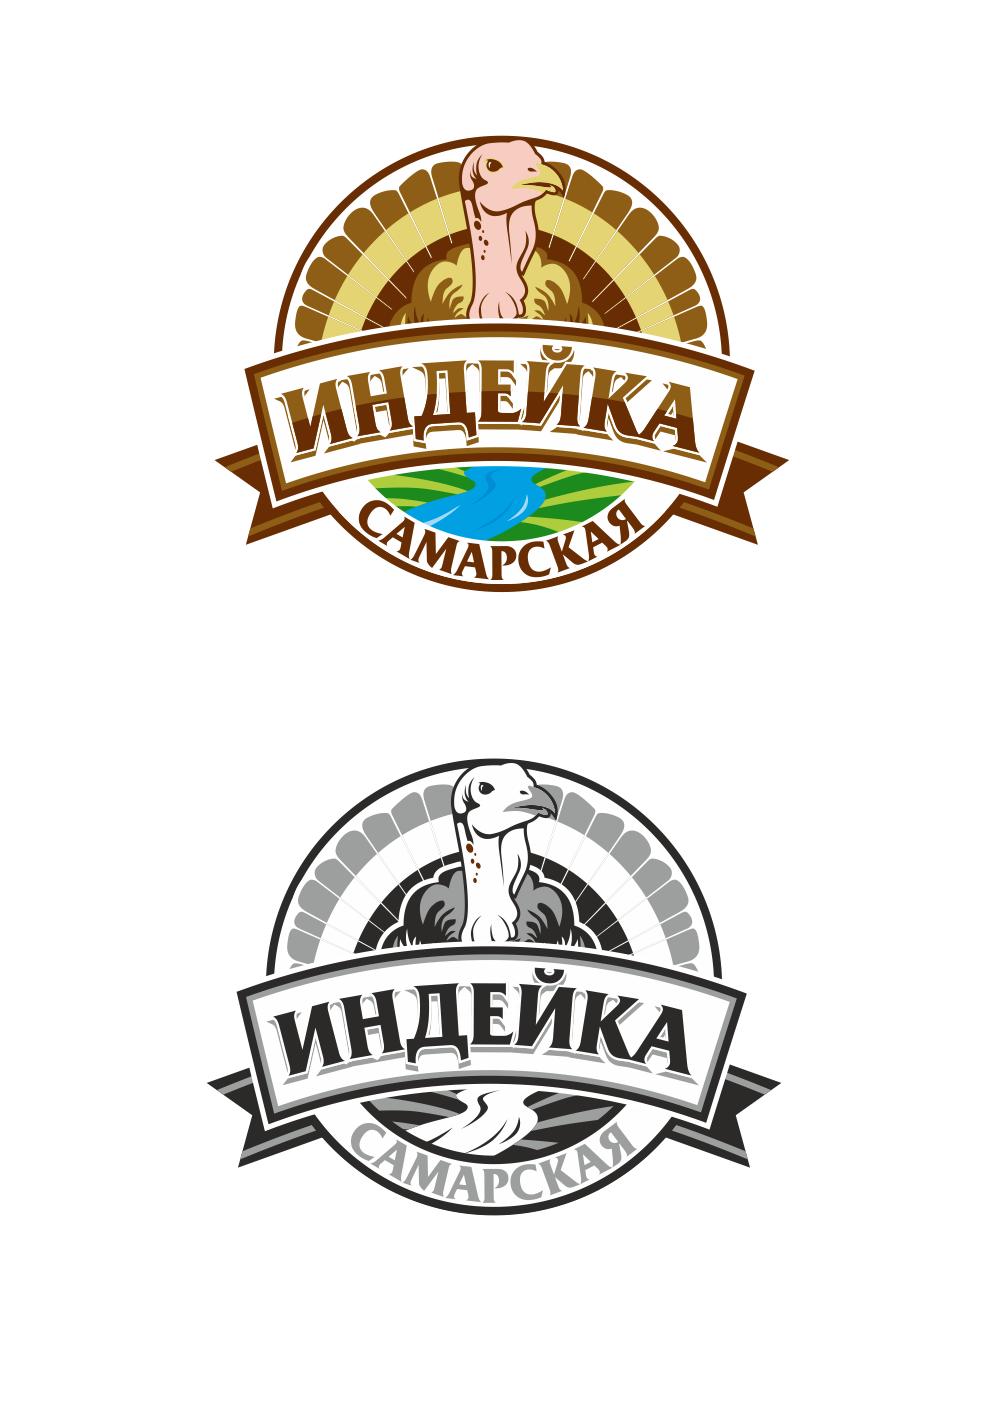 Создание логотипа Сельхоз производителя фото f_31255e5c58097bb3.png